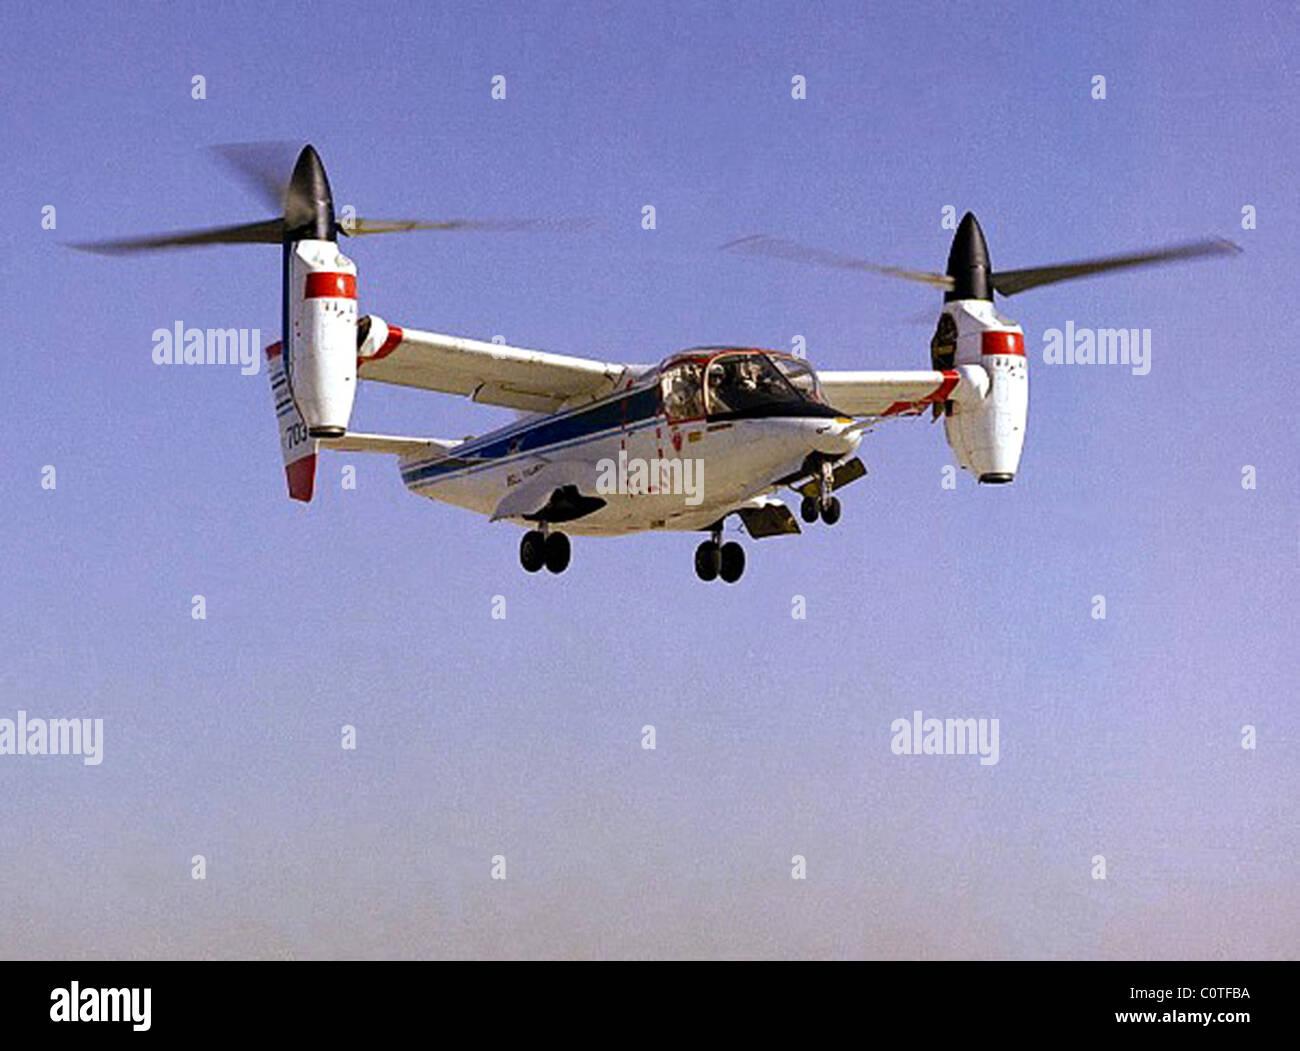 NASA-Army-Bell XV-15 aviones de investigación de rotor basculante Imagen De Stock